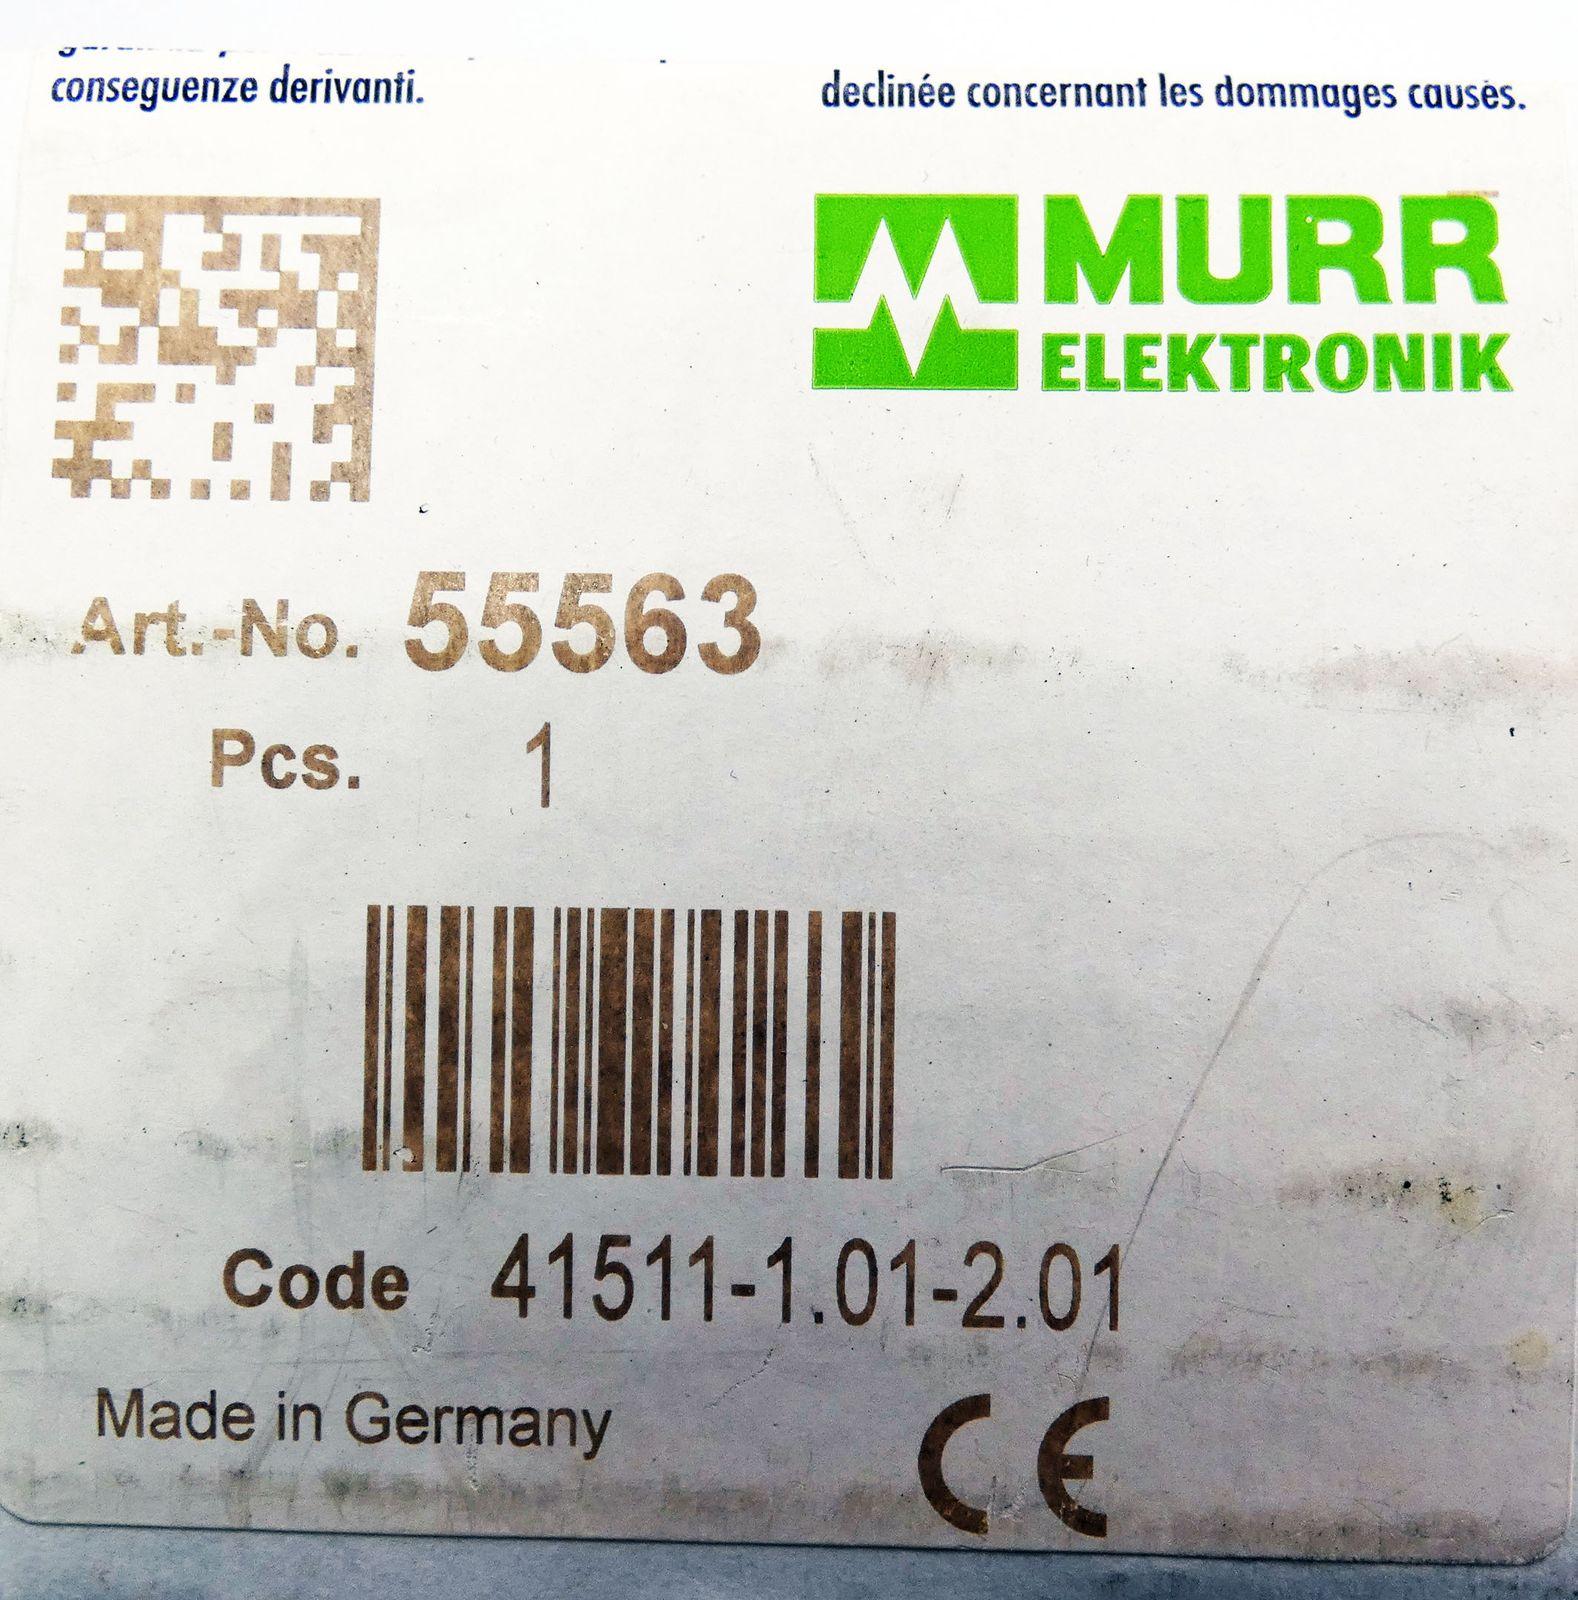 Verbazingwekkend Murr Elektronik MVK-MPNIO F DI8/4 F DO4 PP No. 55563 Profinet GR-74